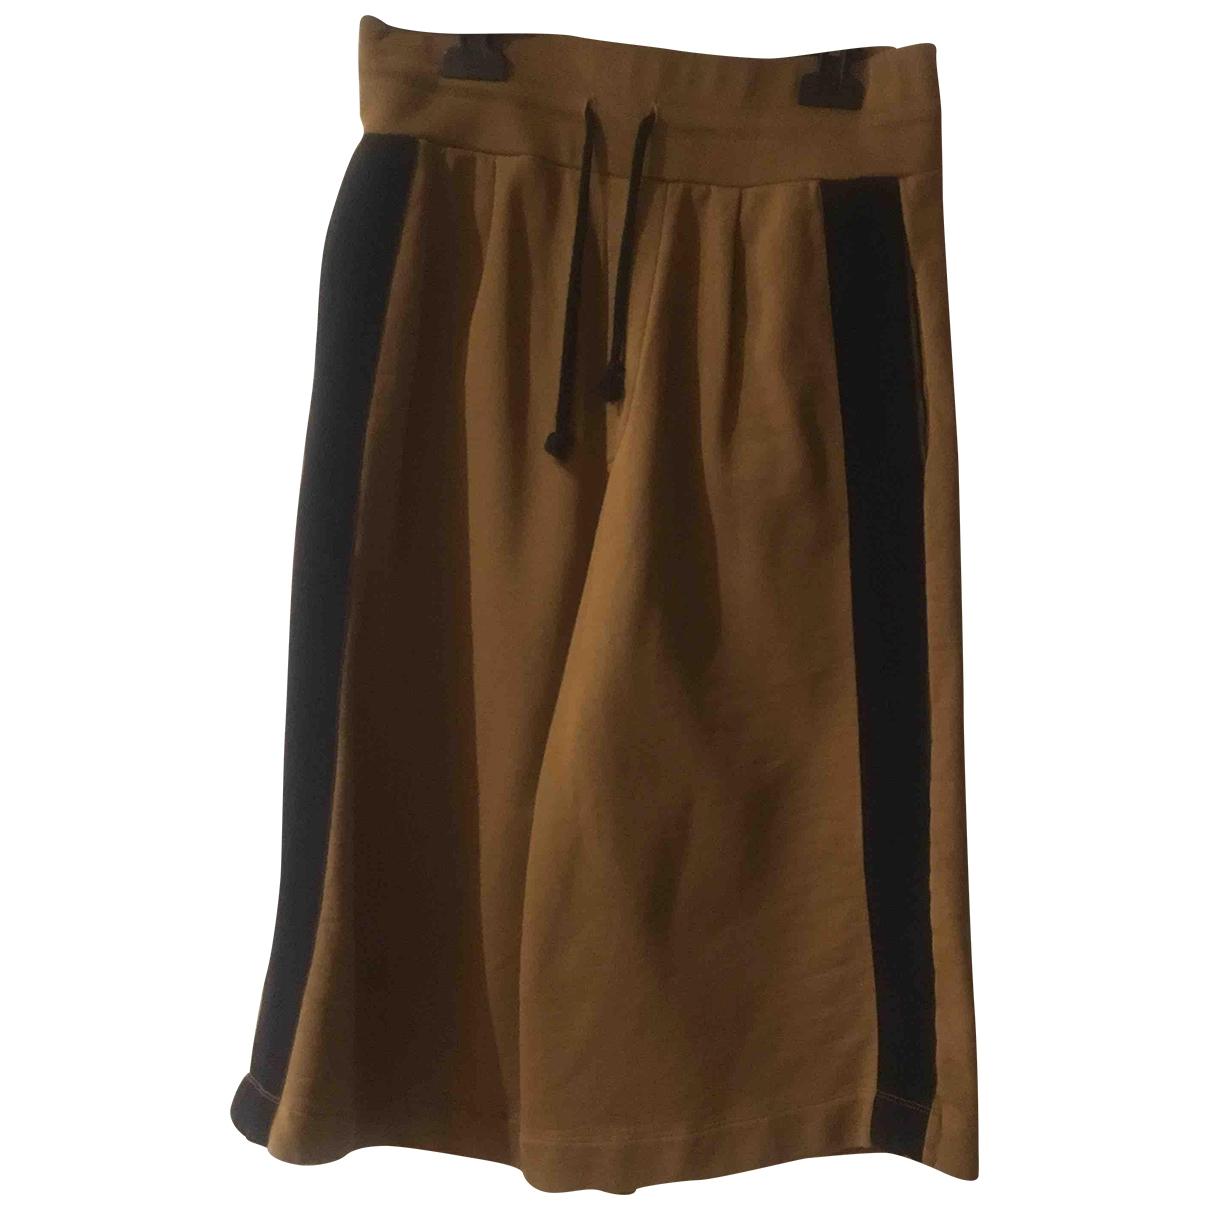 Dries Van Noten \N Brown Cotton Shorts for Women S International